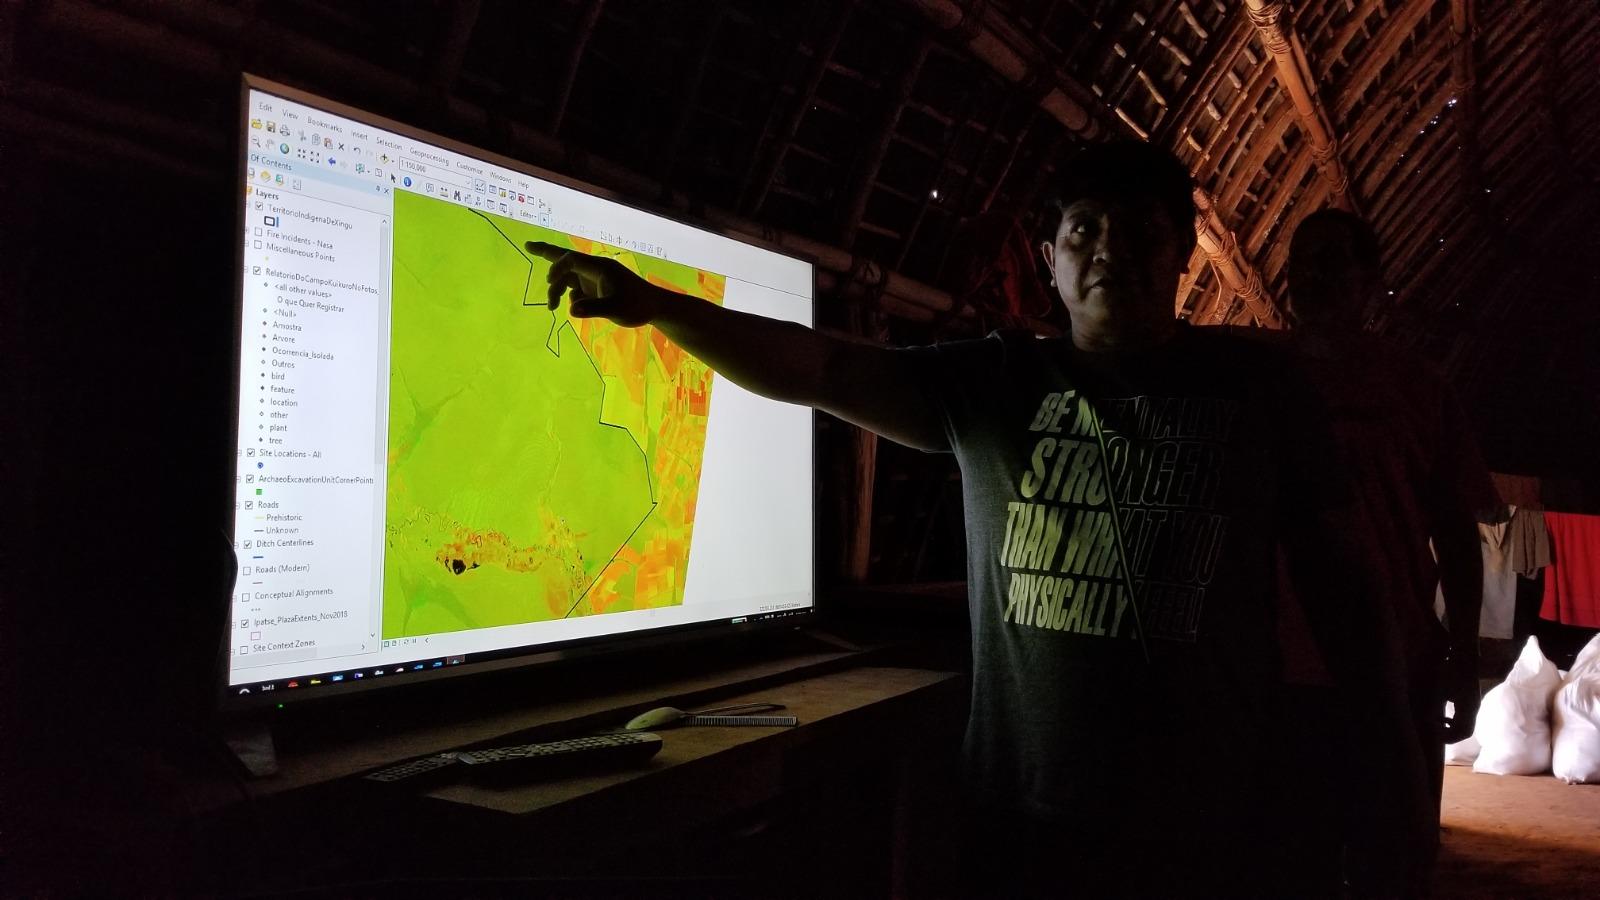 Yanama Kuikuro showing a satellite image of the Xingu territory